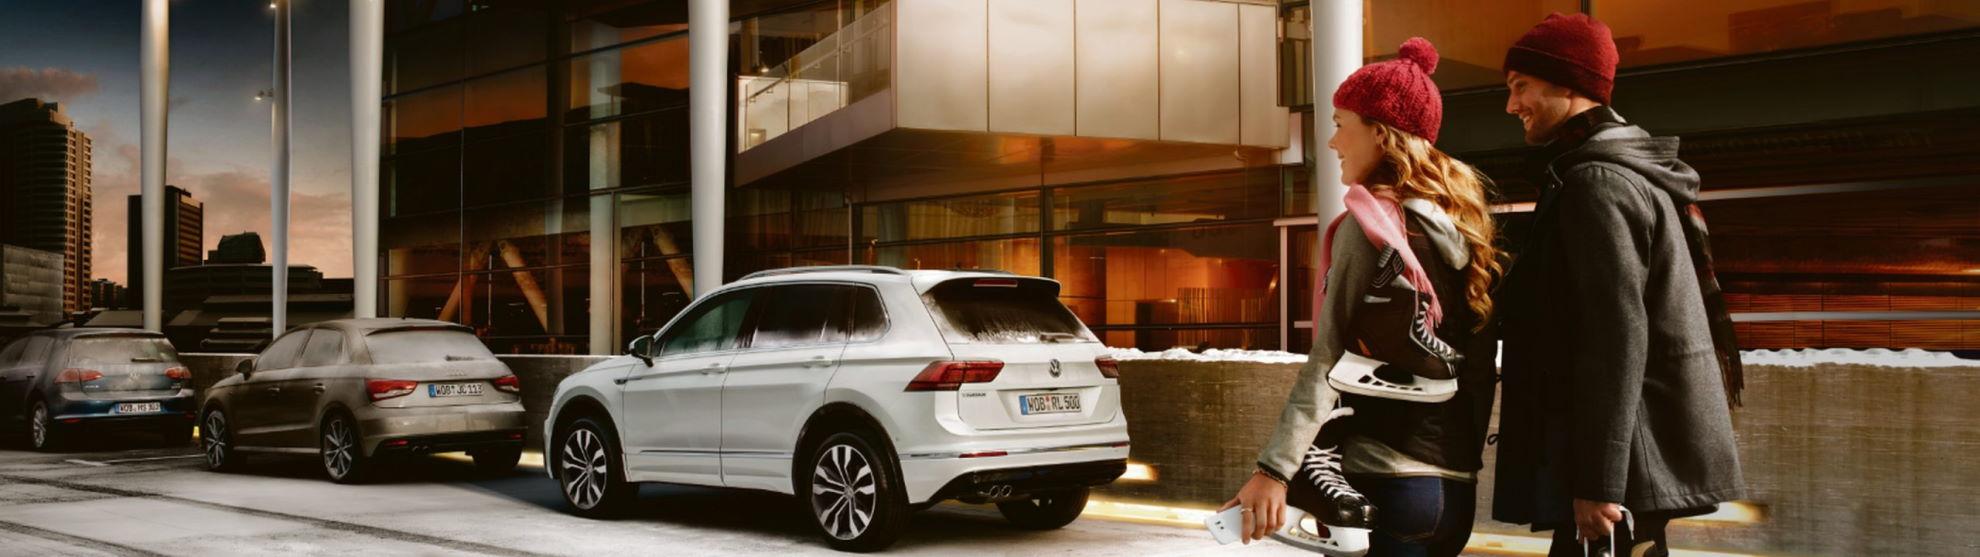 VW Cashback Standheizung